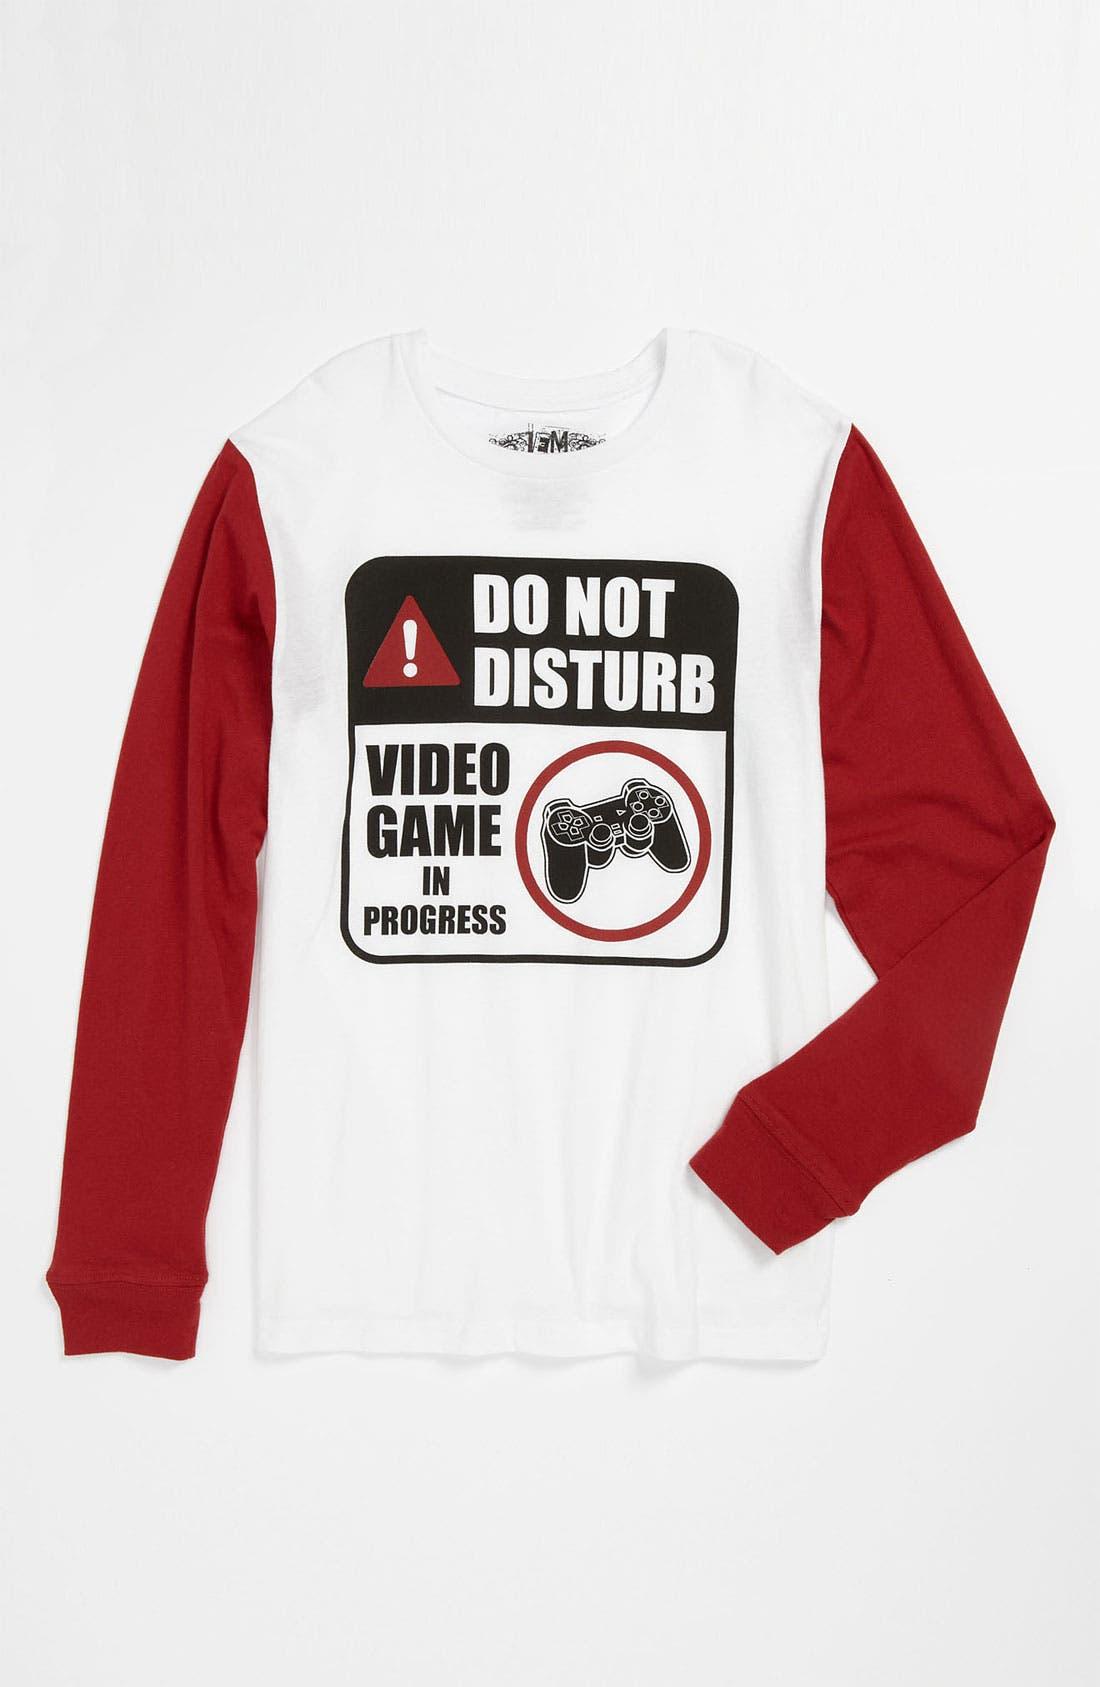 Alternate Image 1 Selected - Jem 'Game in Progress' T-Shirt (Big Boys)